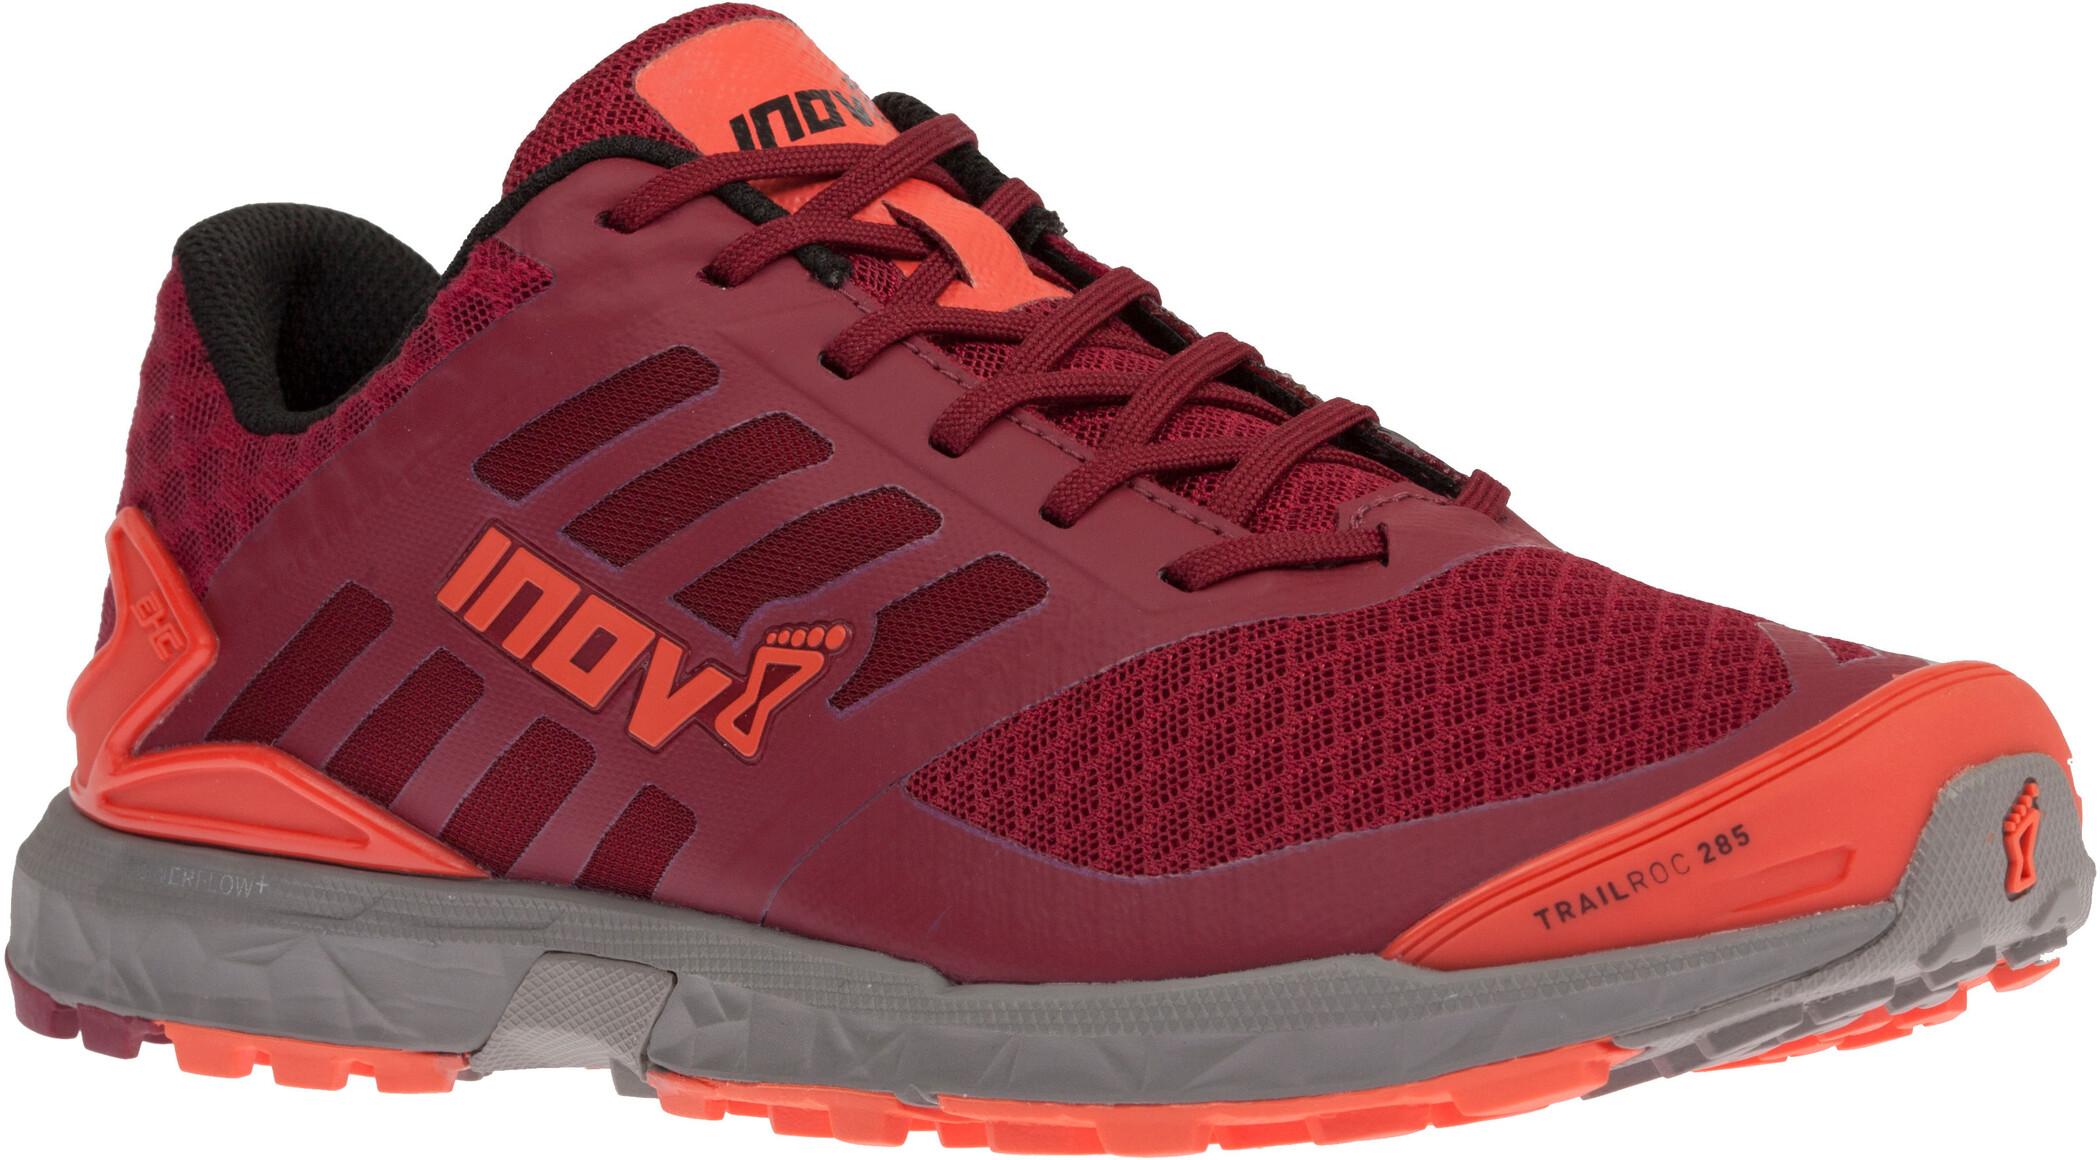 inov 8 Trailroc 285 Shoes Dam redcoral